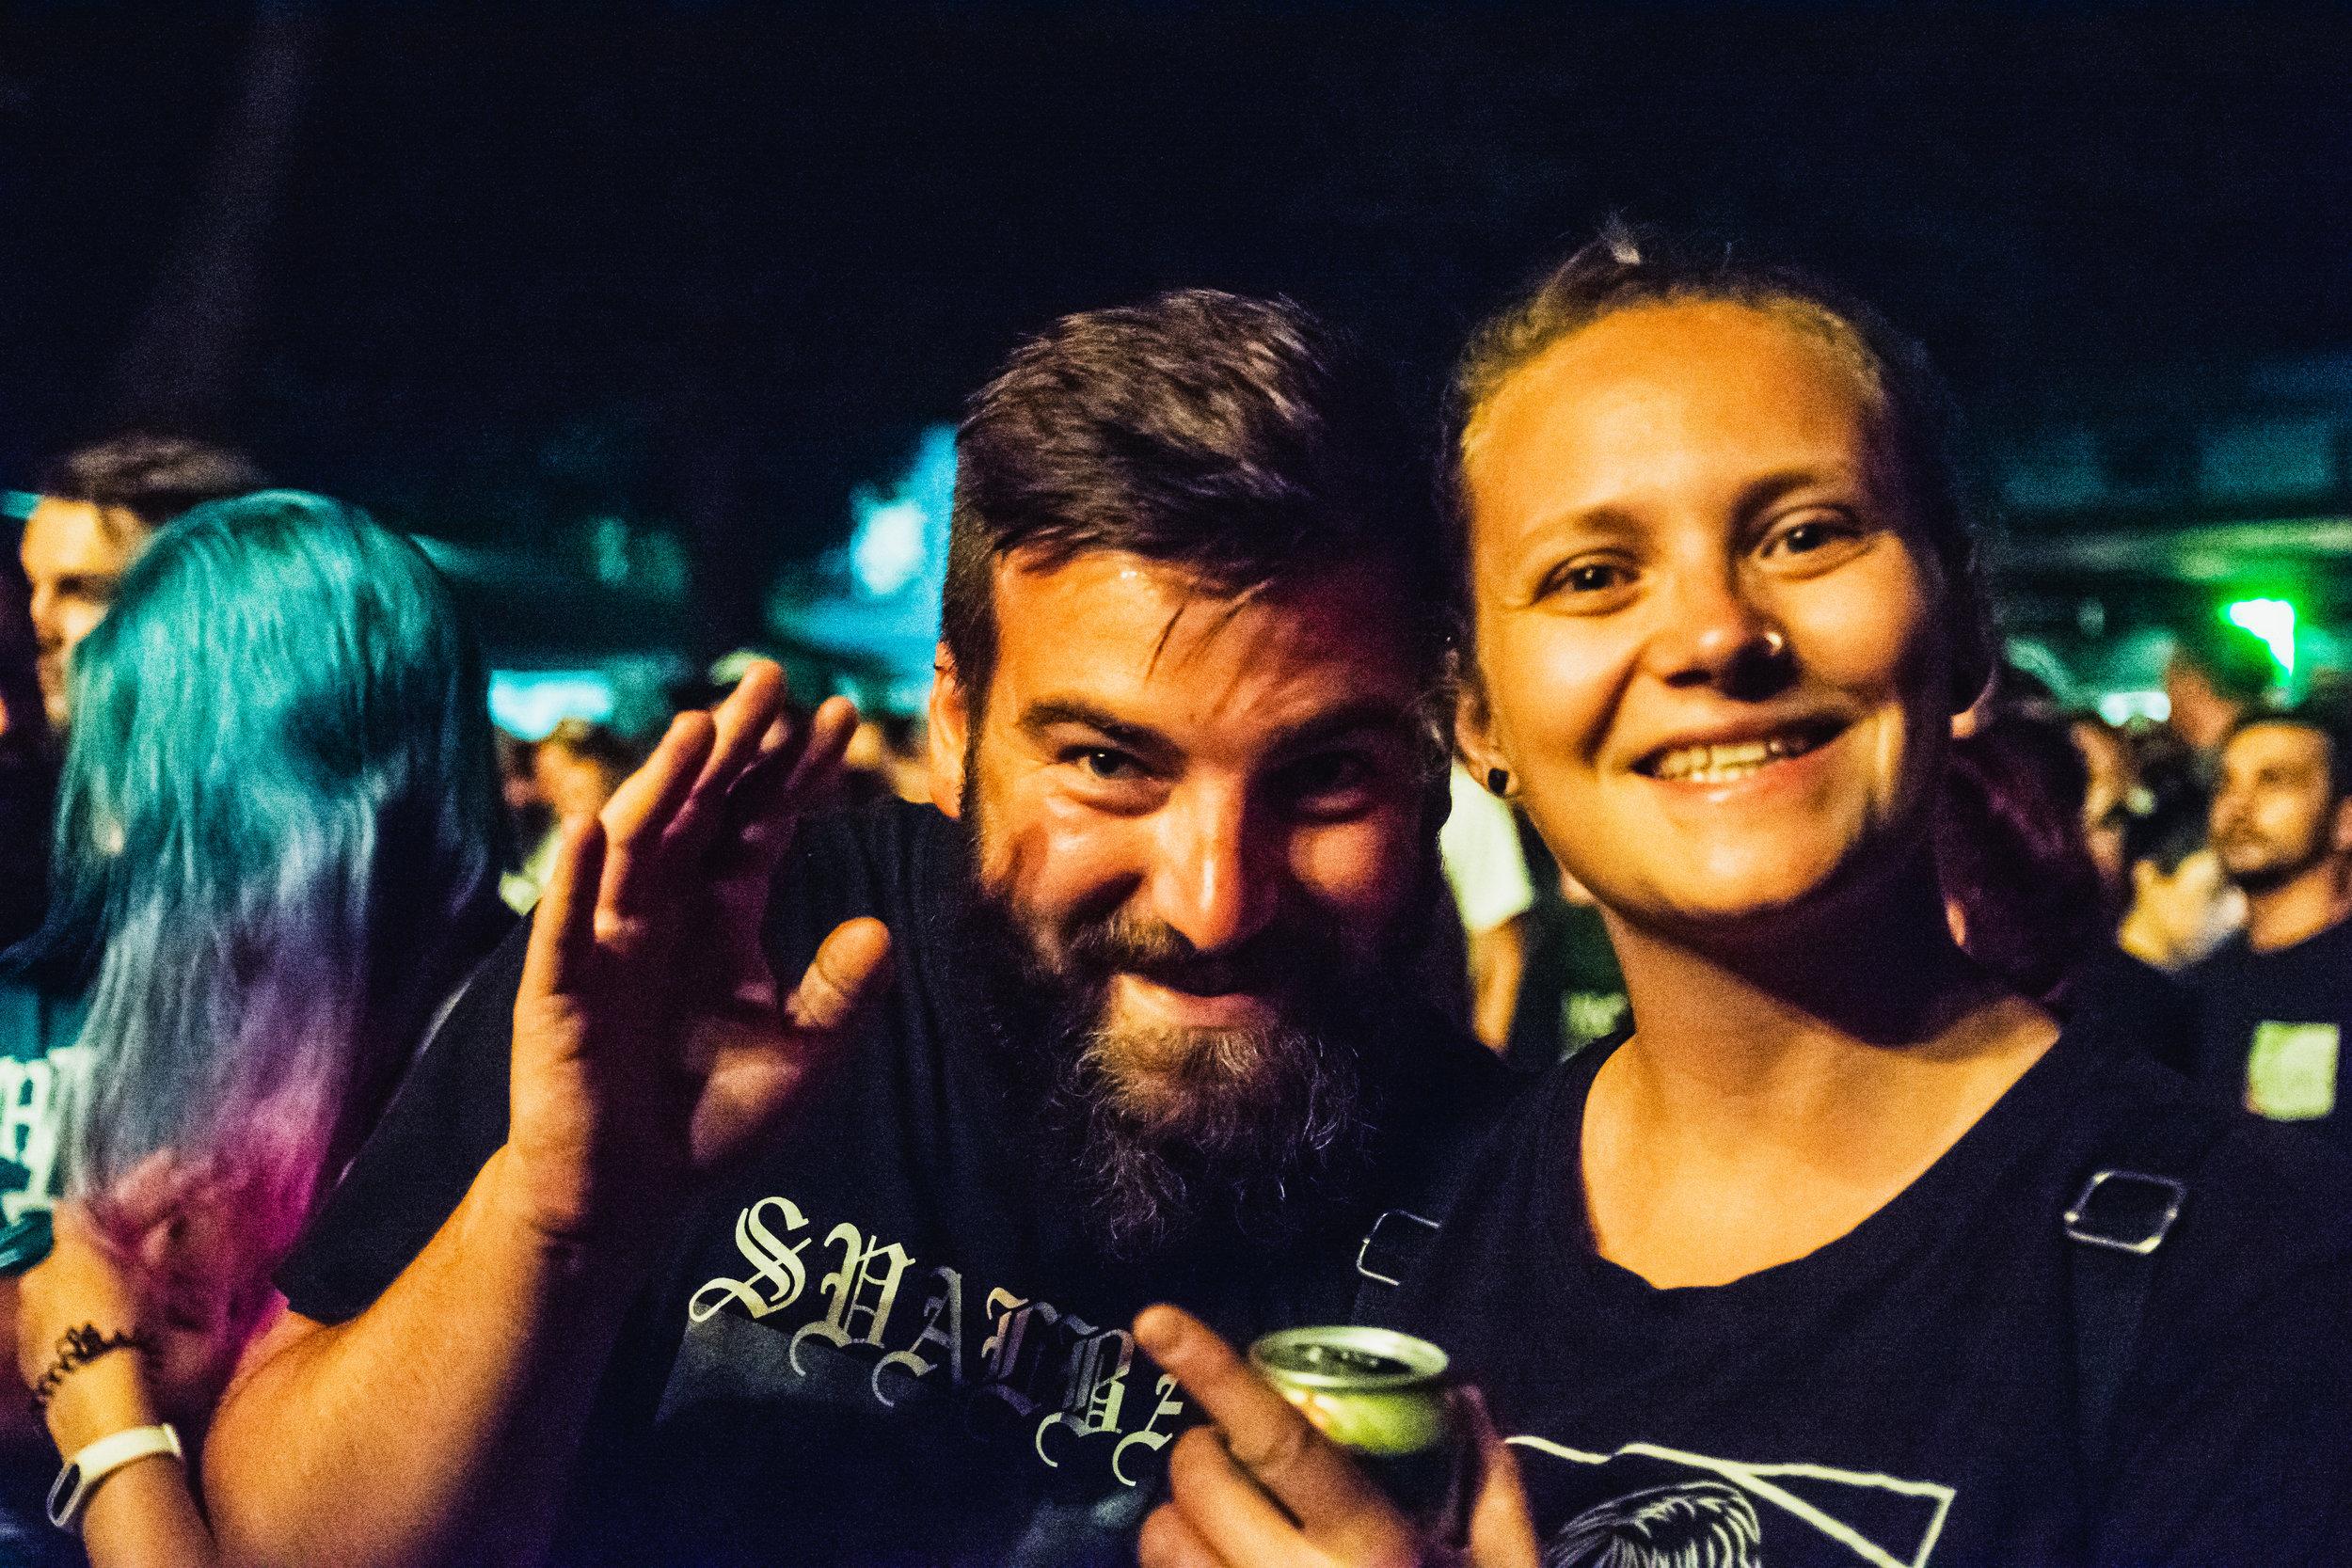 Punk-Rock-Holiday-Wednesday_83_2018August 08, 2018.jpg